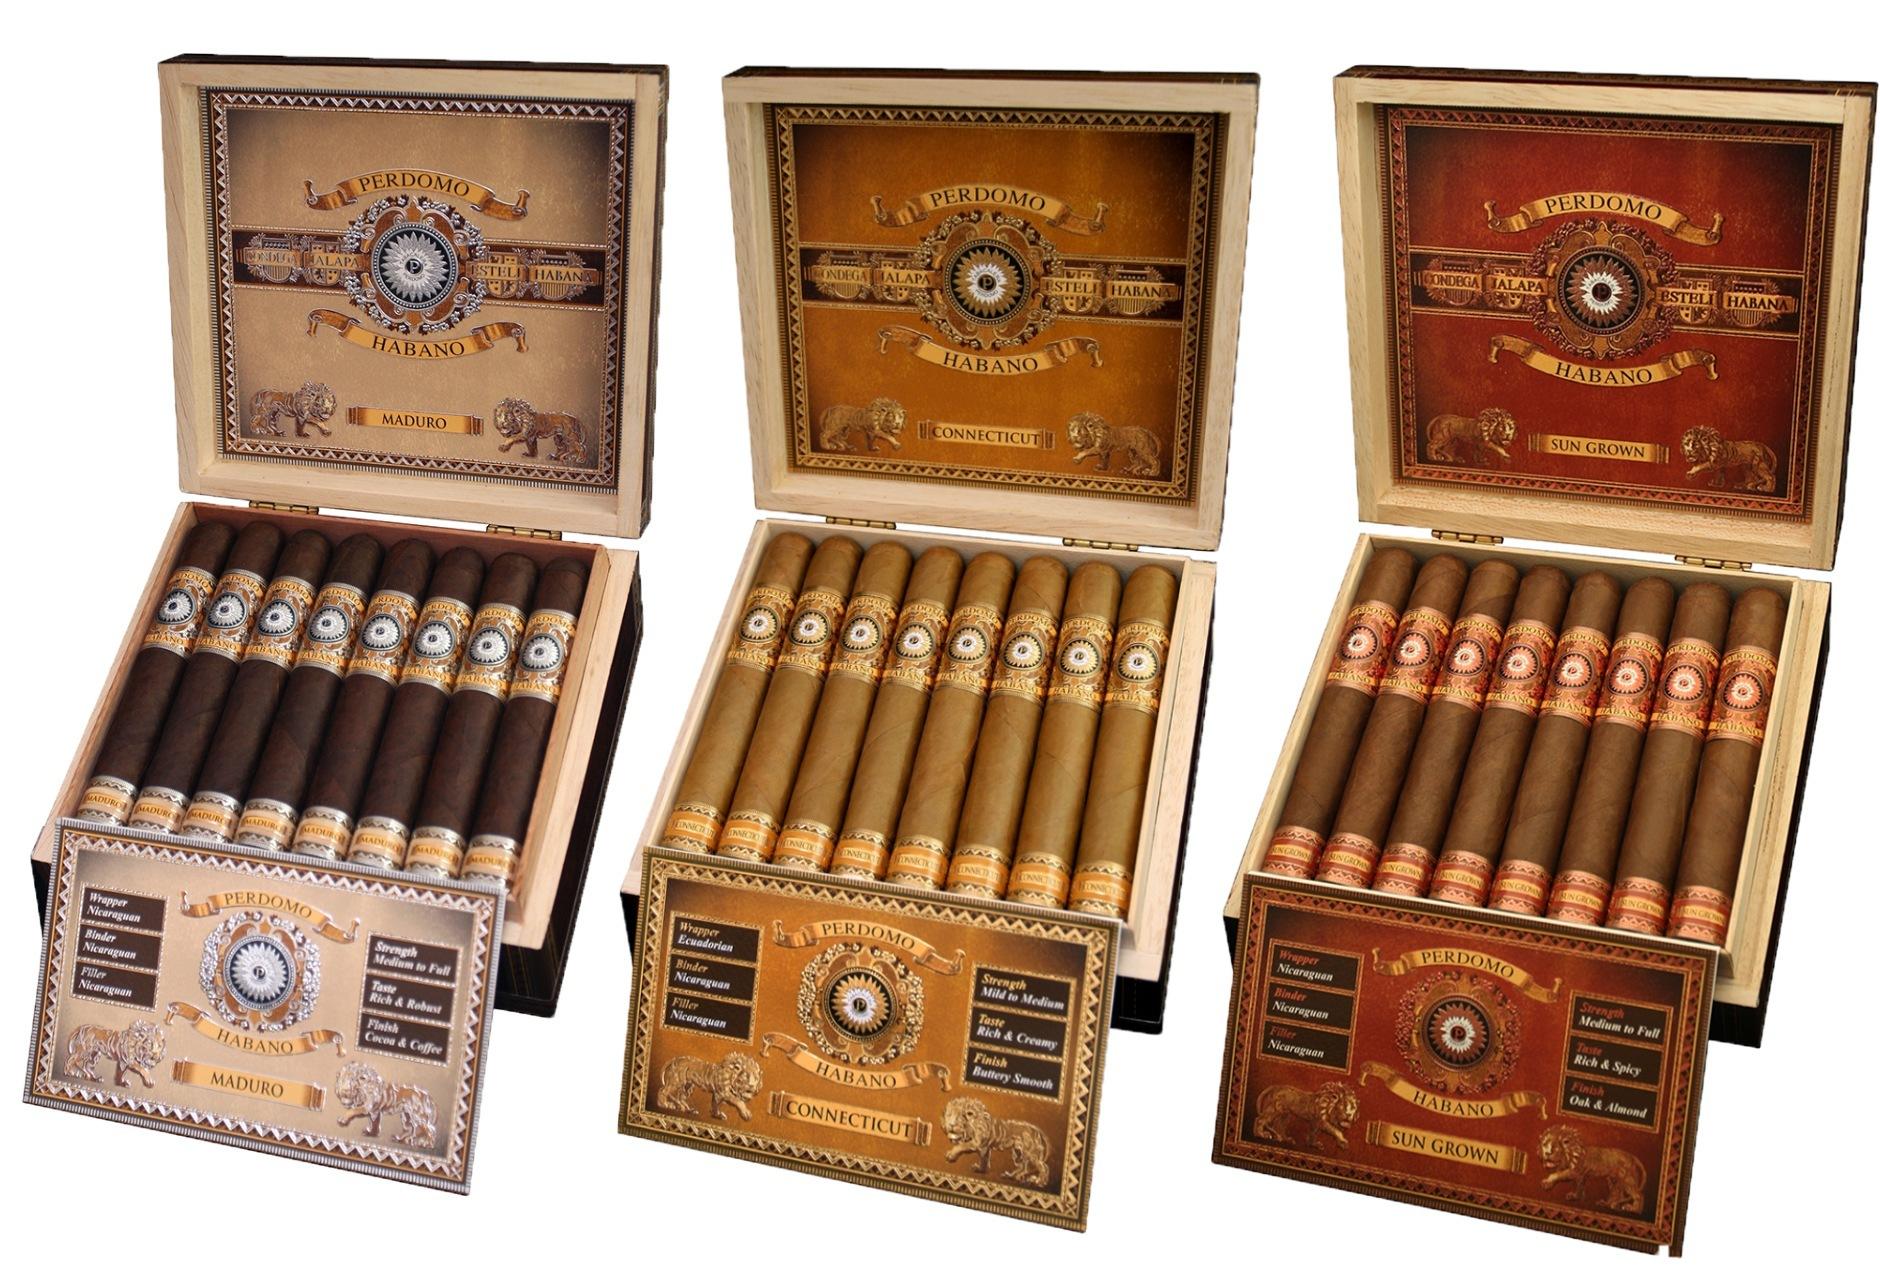 Perdomo Habano Bourbon Barrel-Aged composite feautre